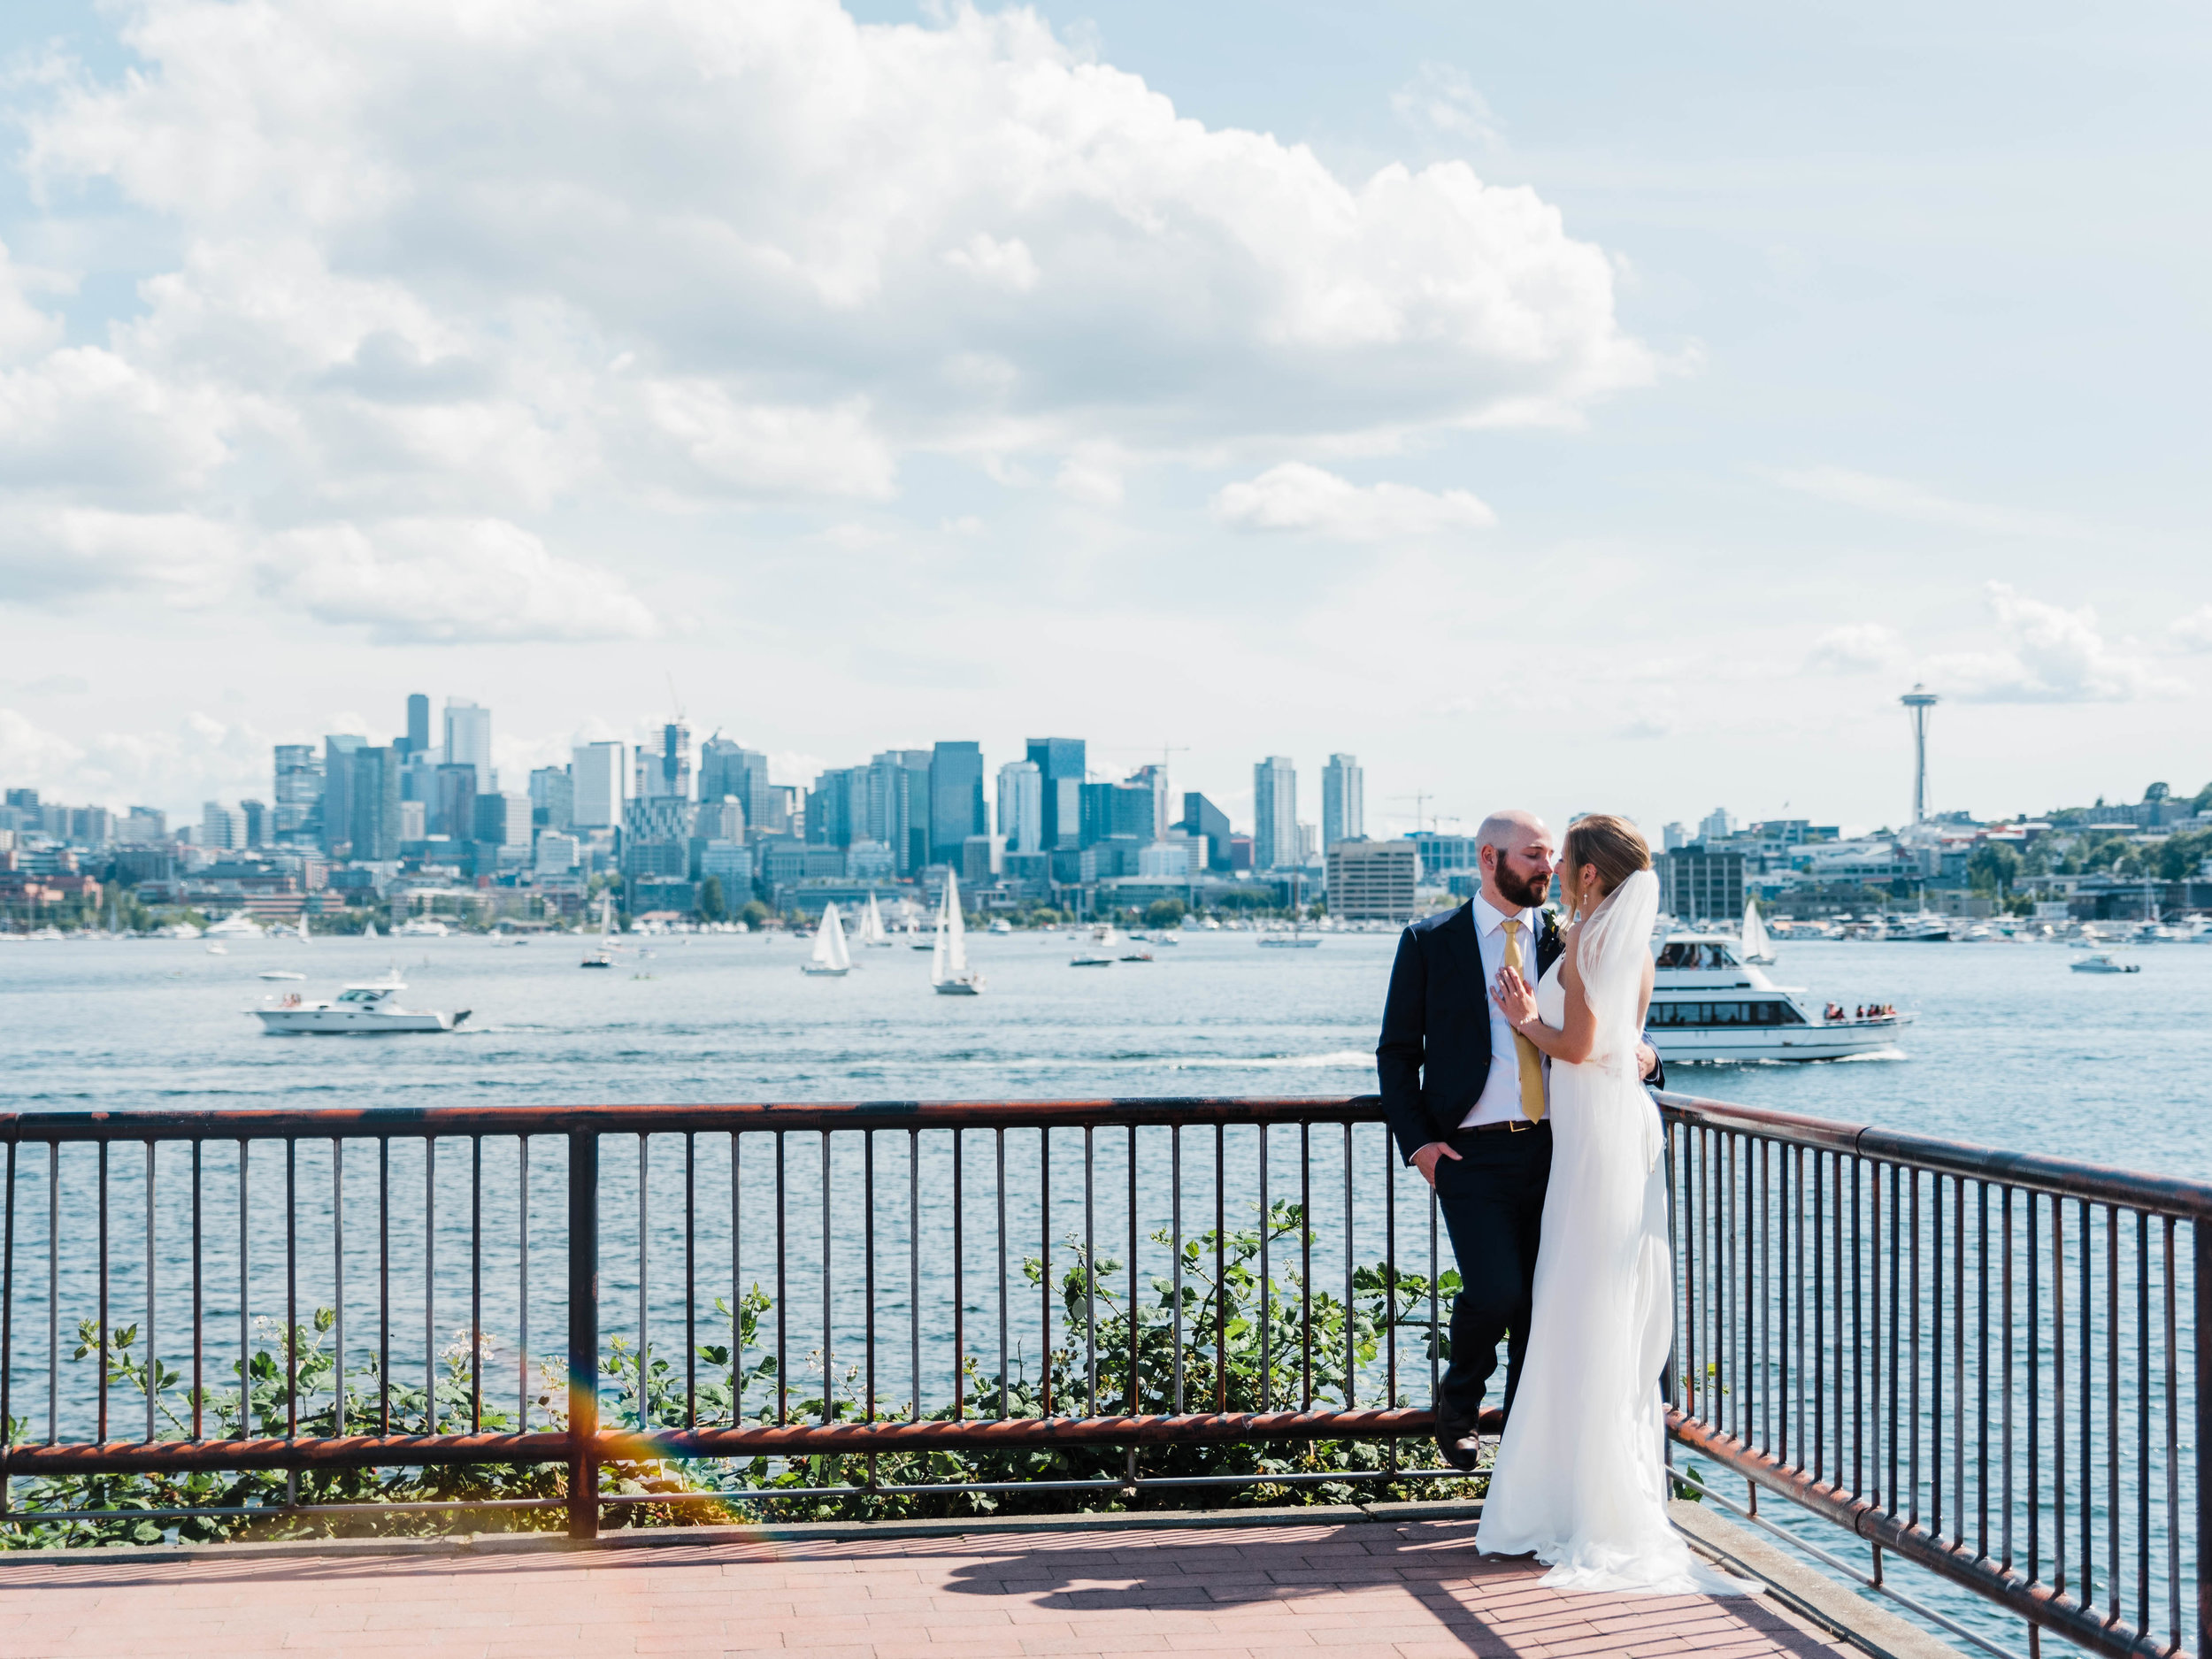 Seattle Wedding- MV Skansonia - Anna + Josh -  (929) - Copy.jpg